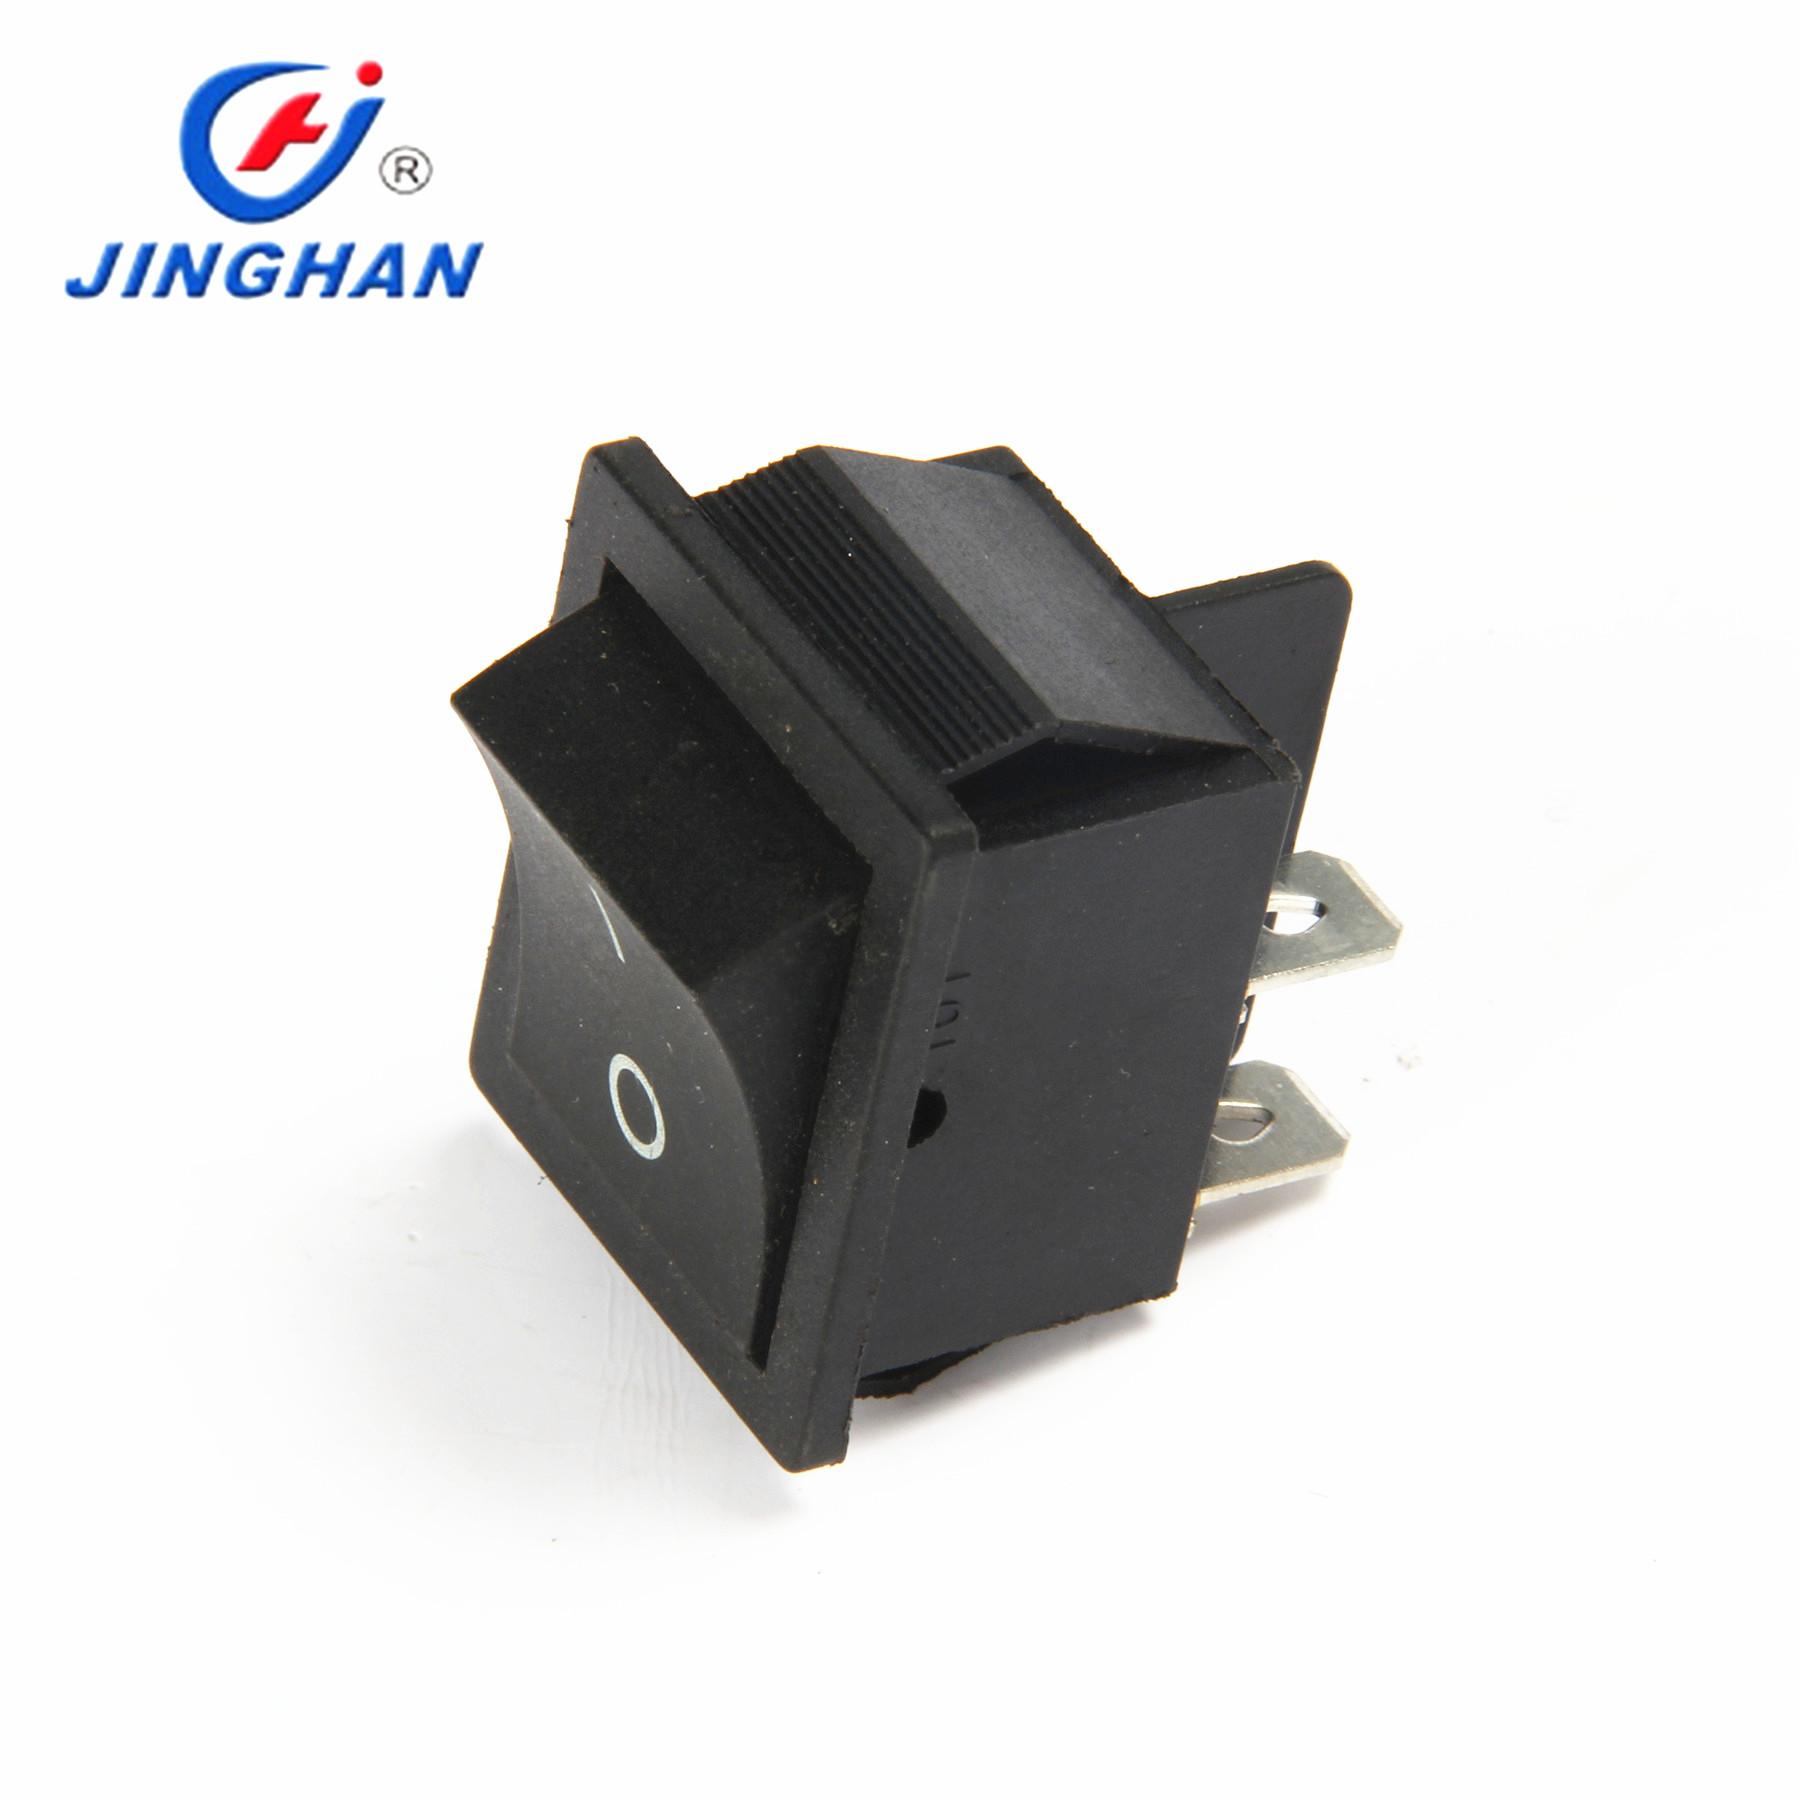 12V 4 Pin Rocker Switch Wiring Diagram from sc01.alicdn.com